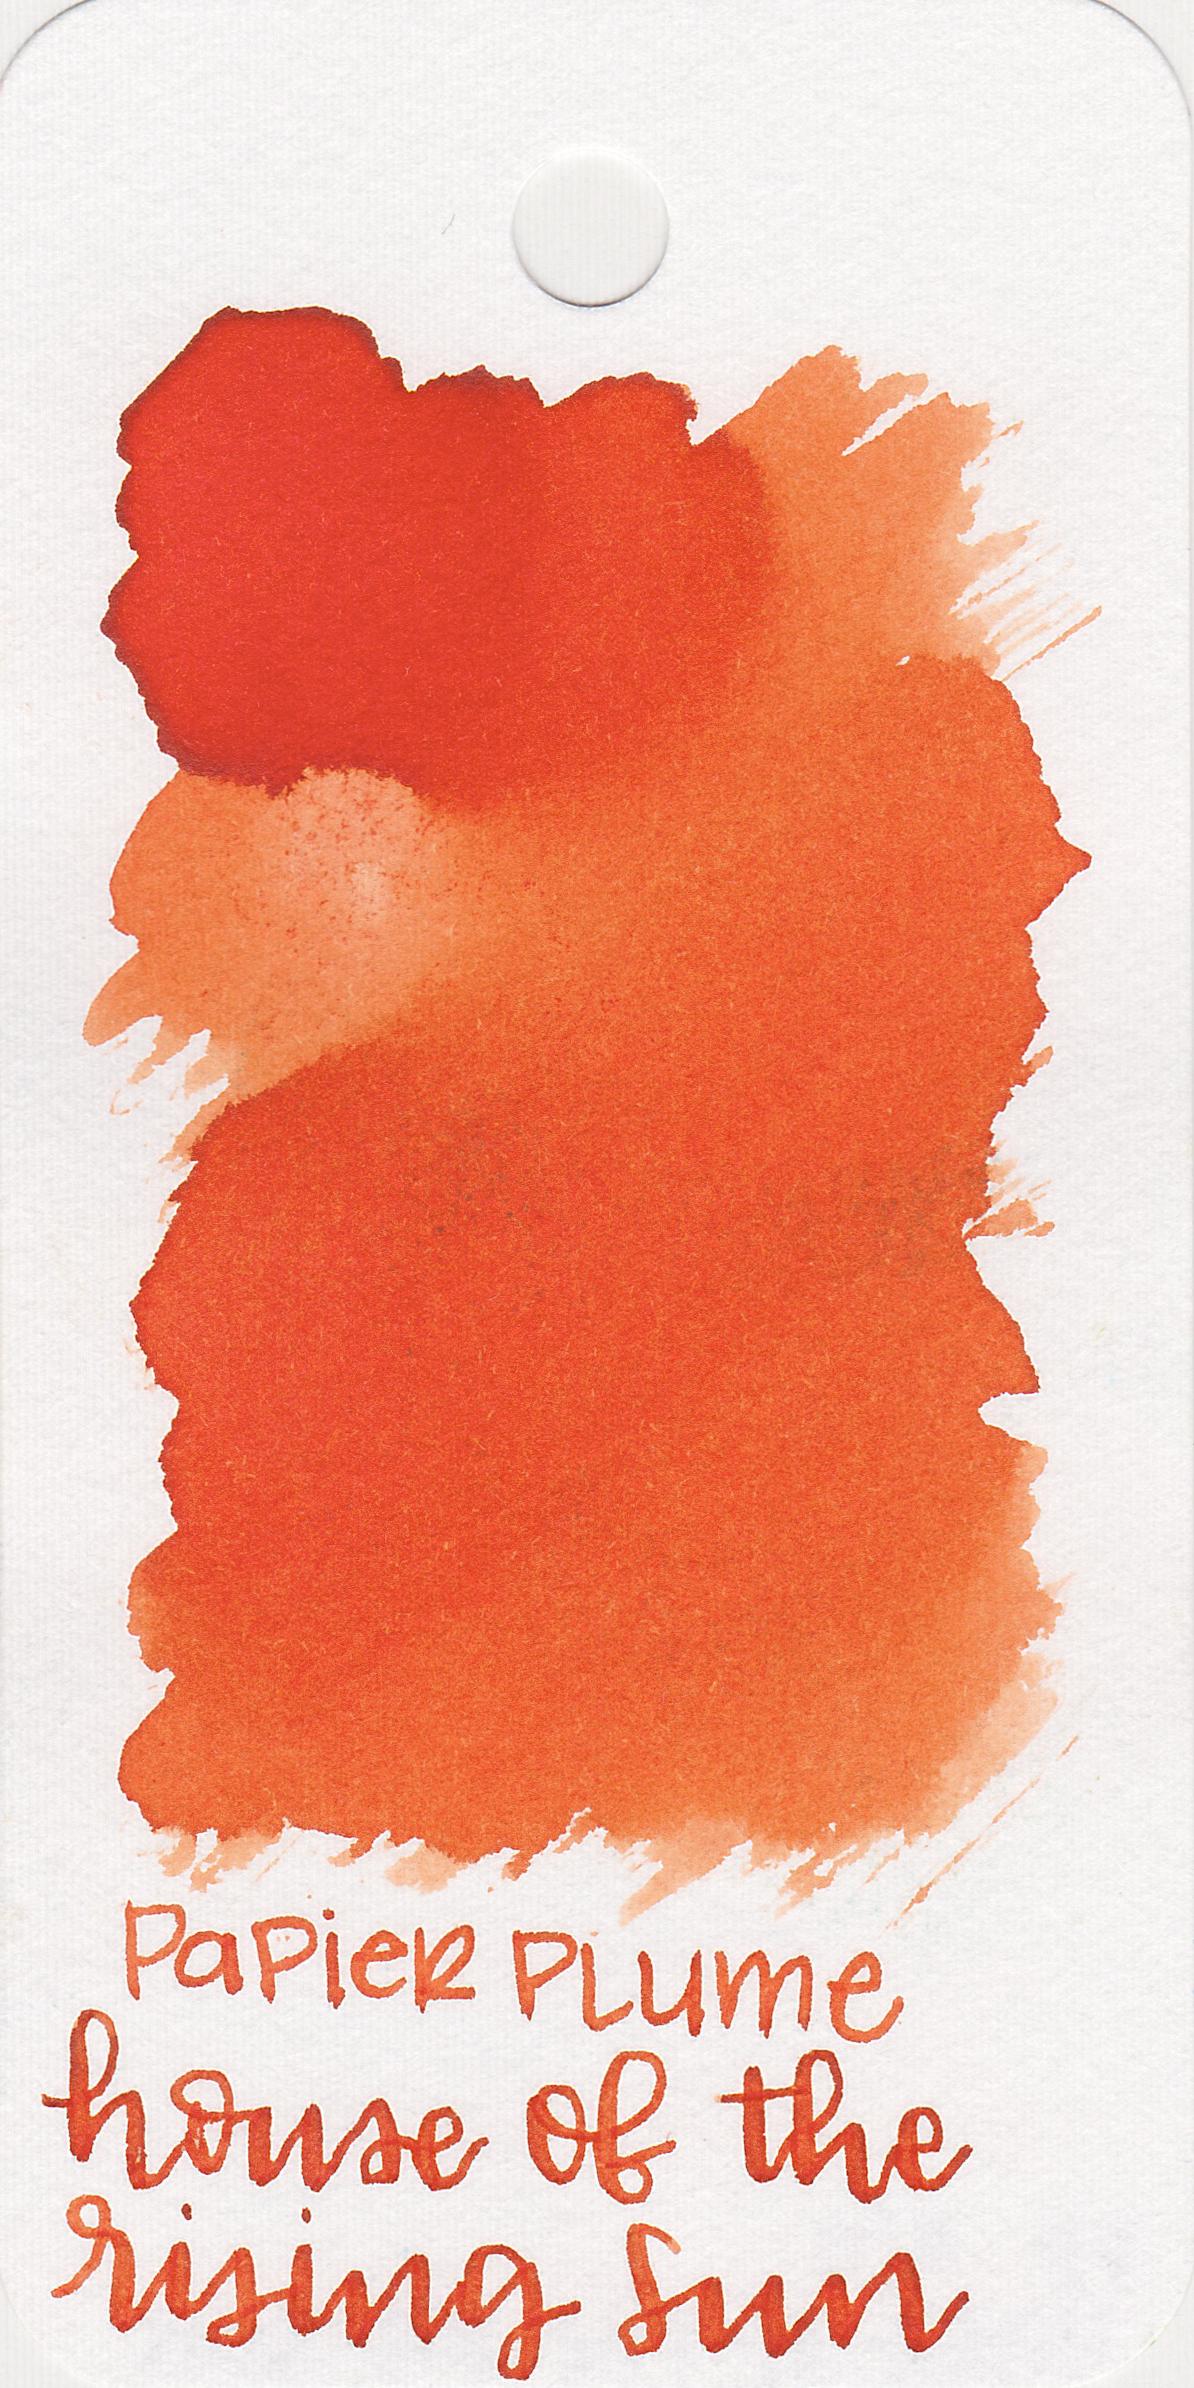 The color: - Rising Sun is a medium orange, ranging from orange to red-orange.